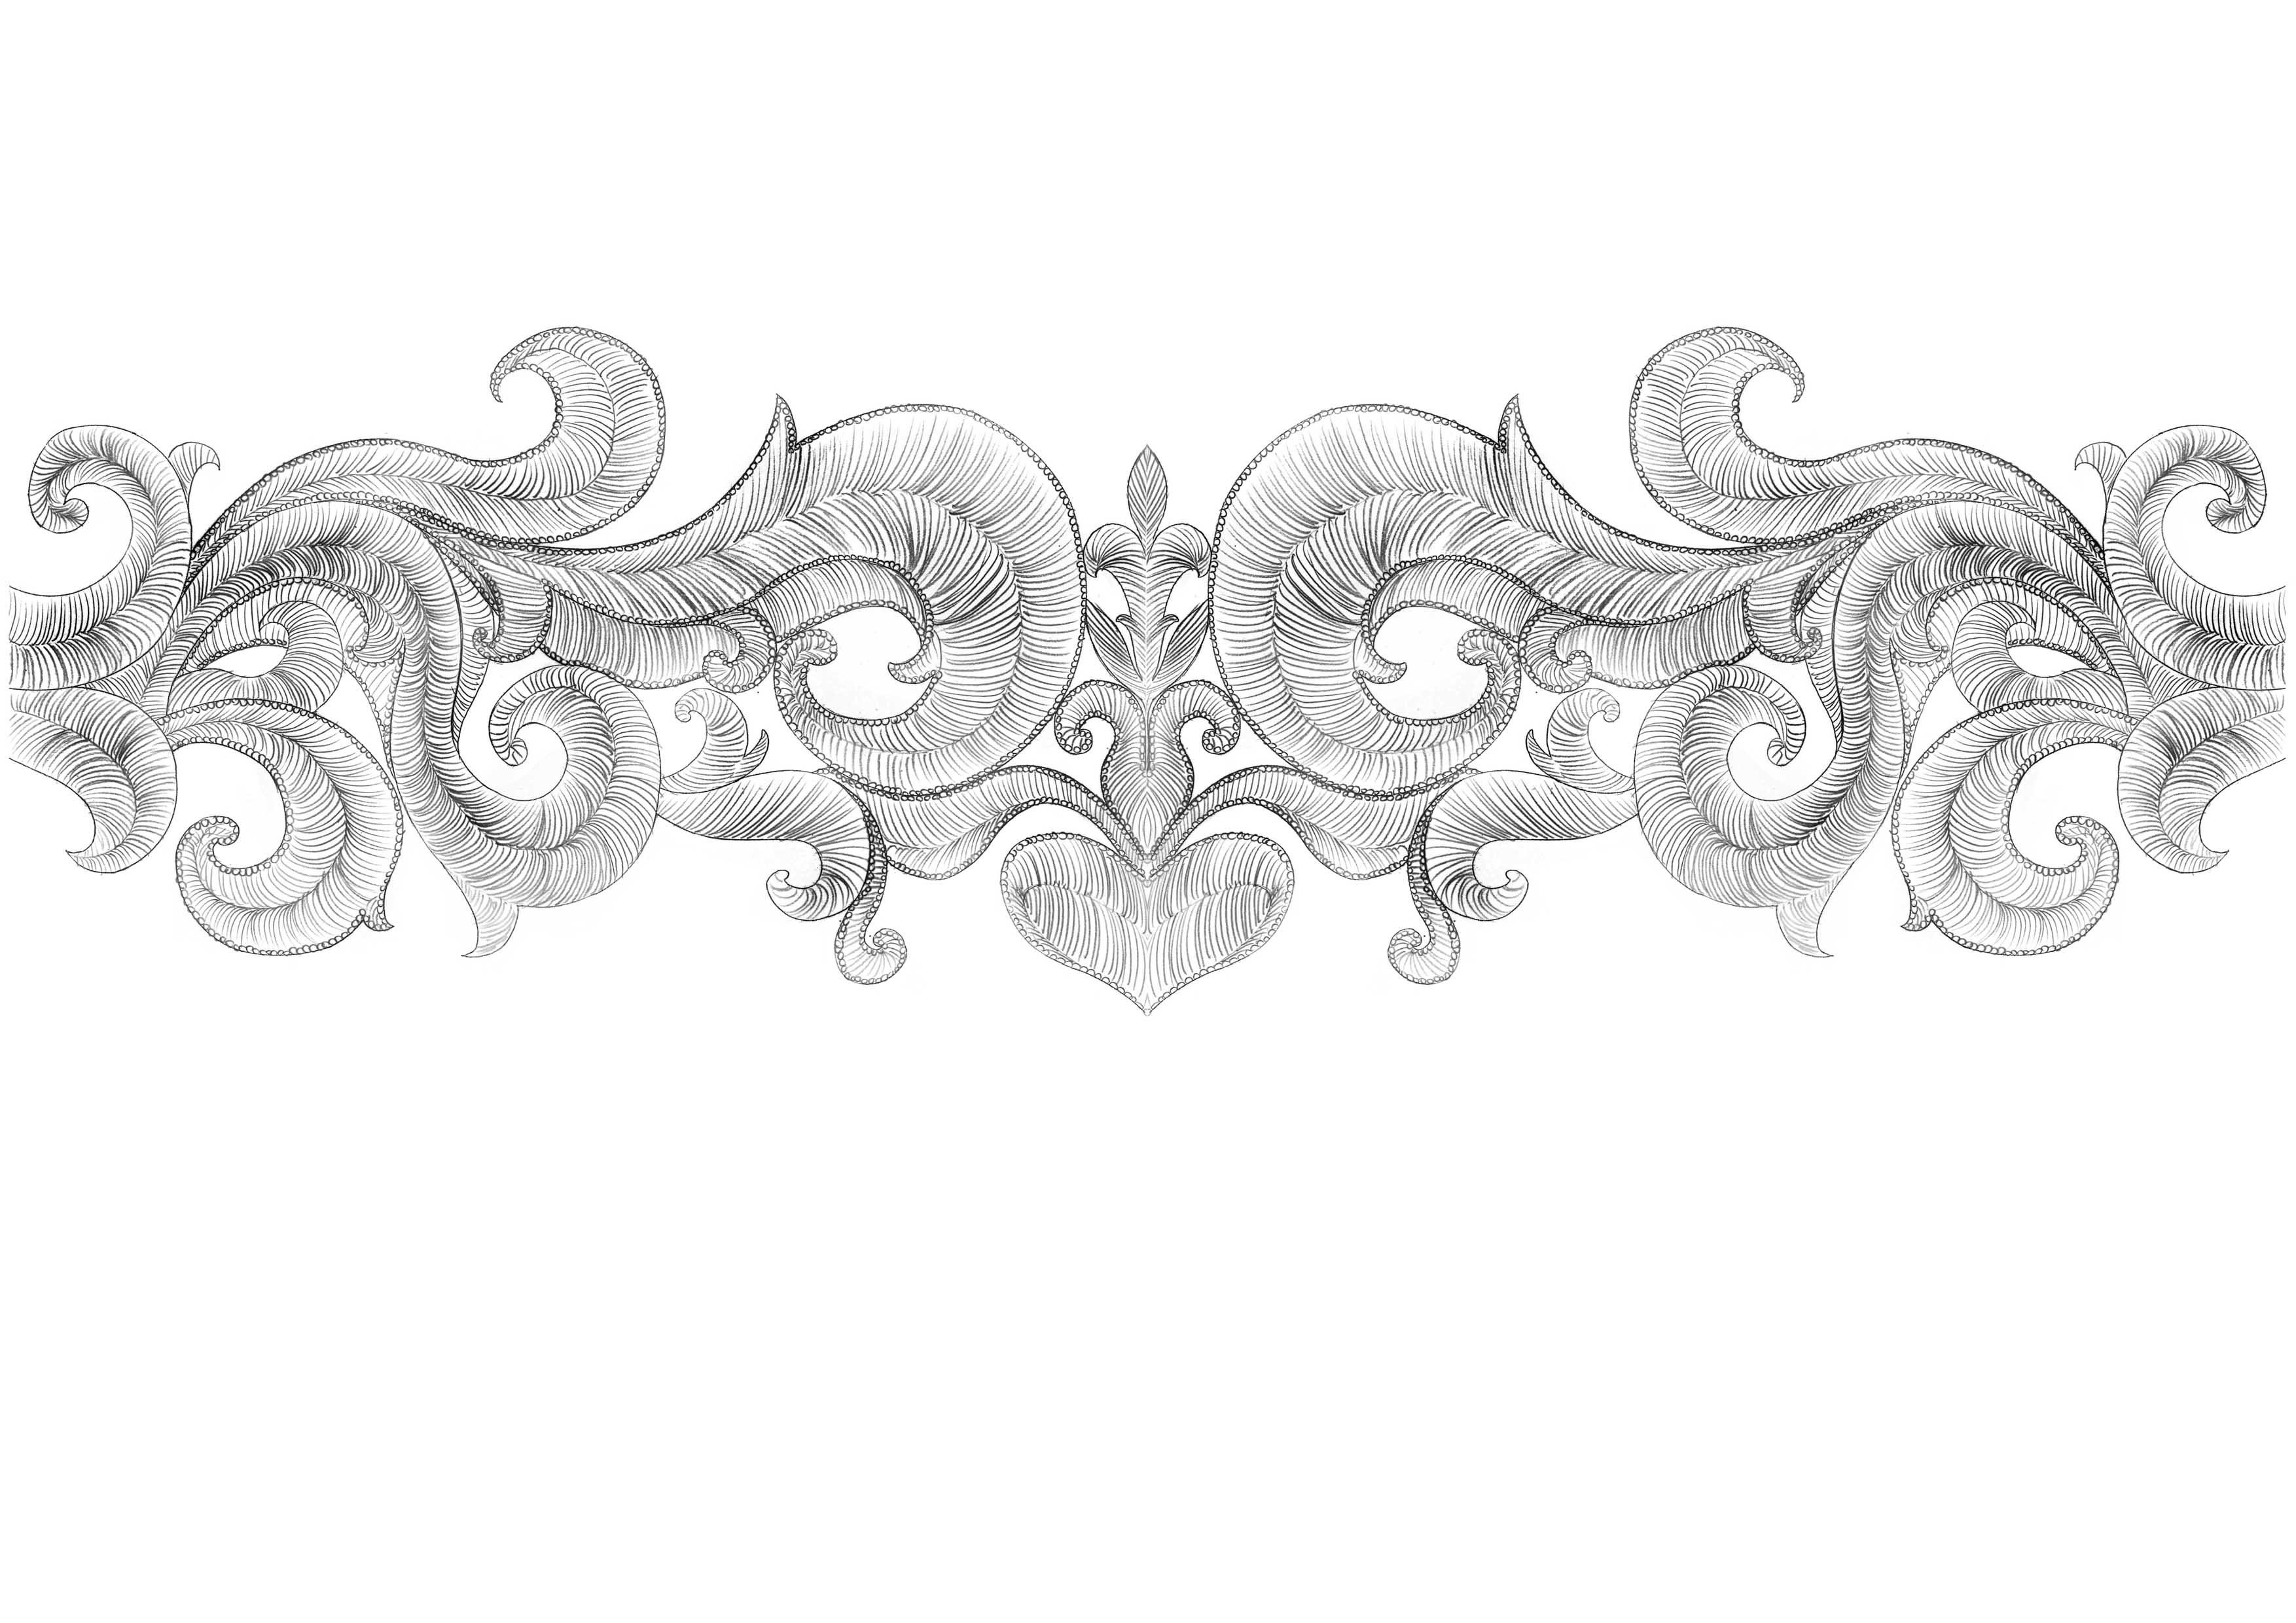 Threadwork artwork